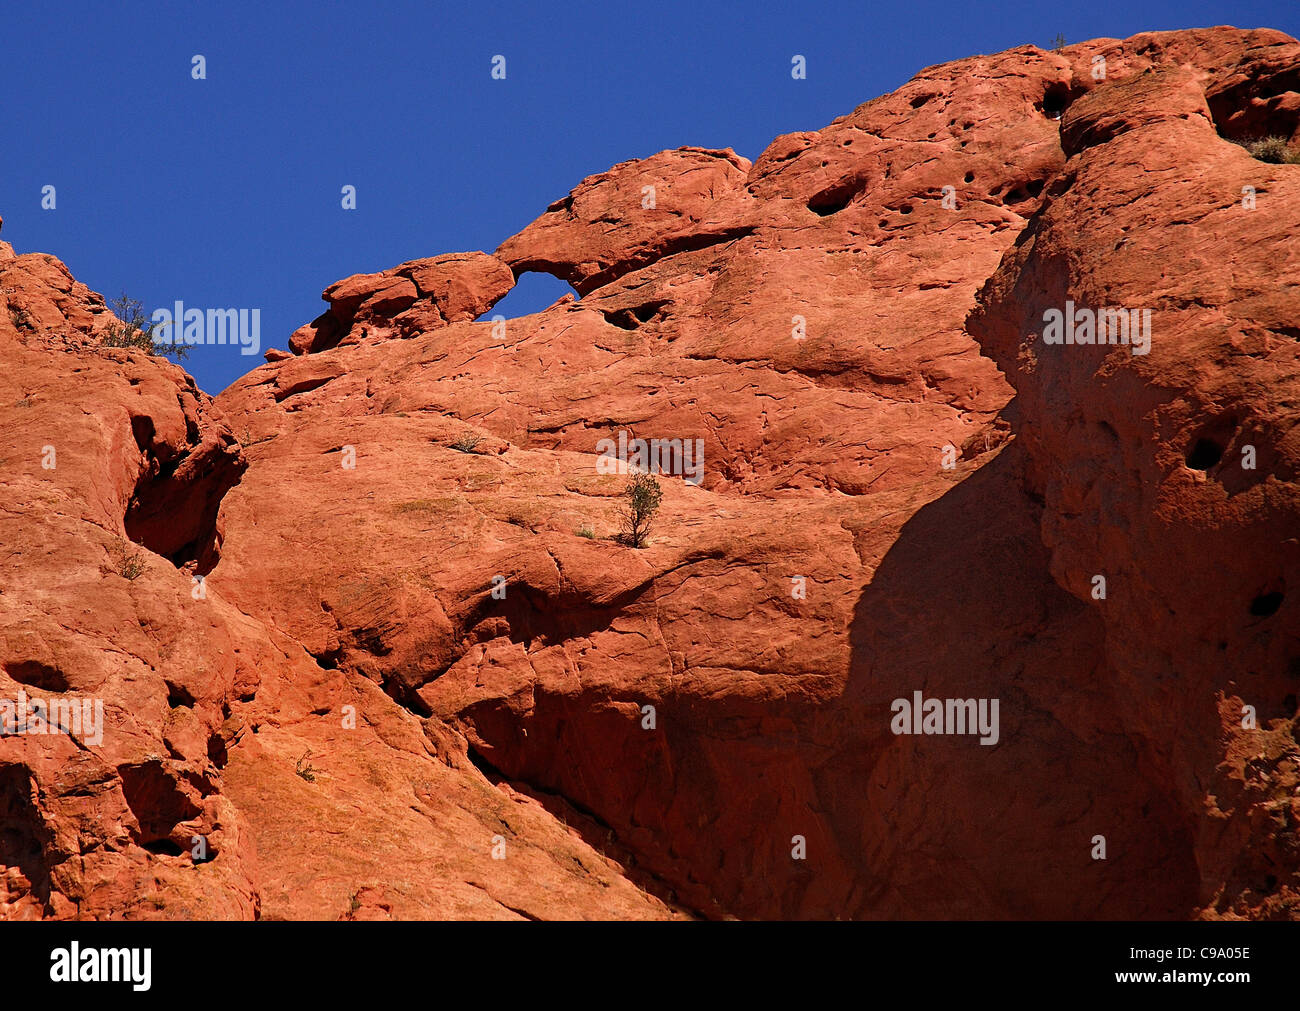 USA, Colorado, Colorado Springs, Garden of the Gods public park eroded sandstone rock. - Stock Image